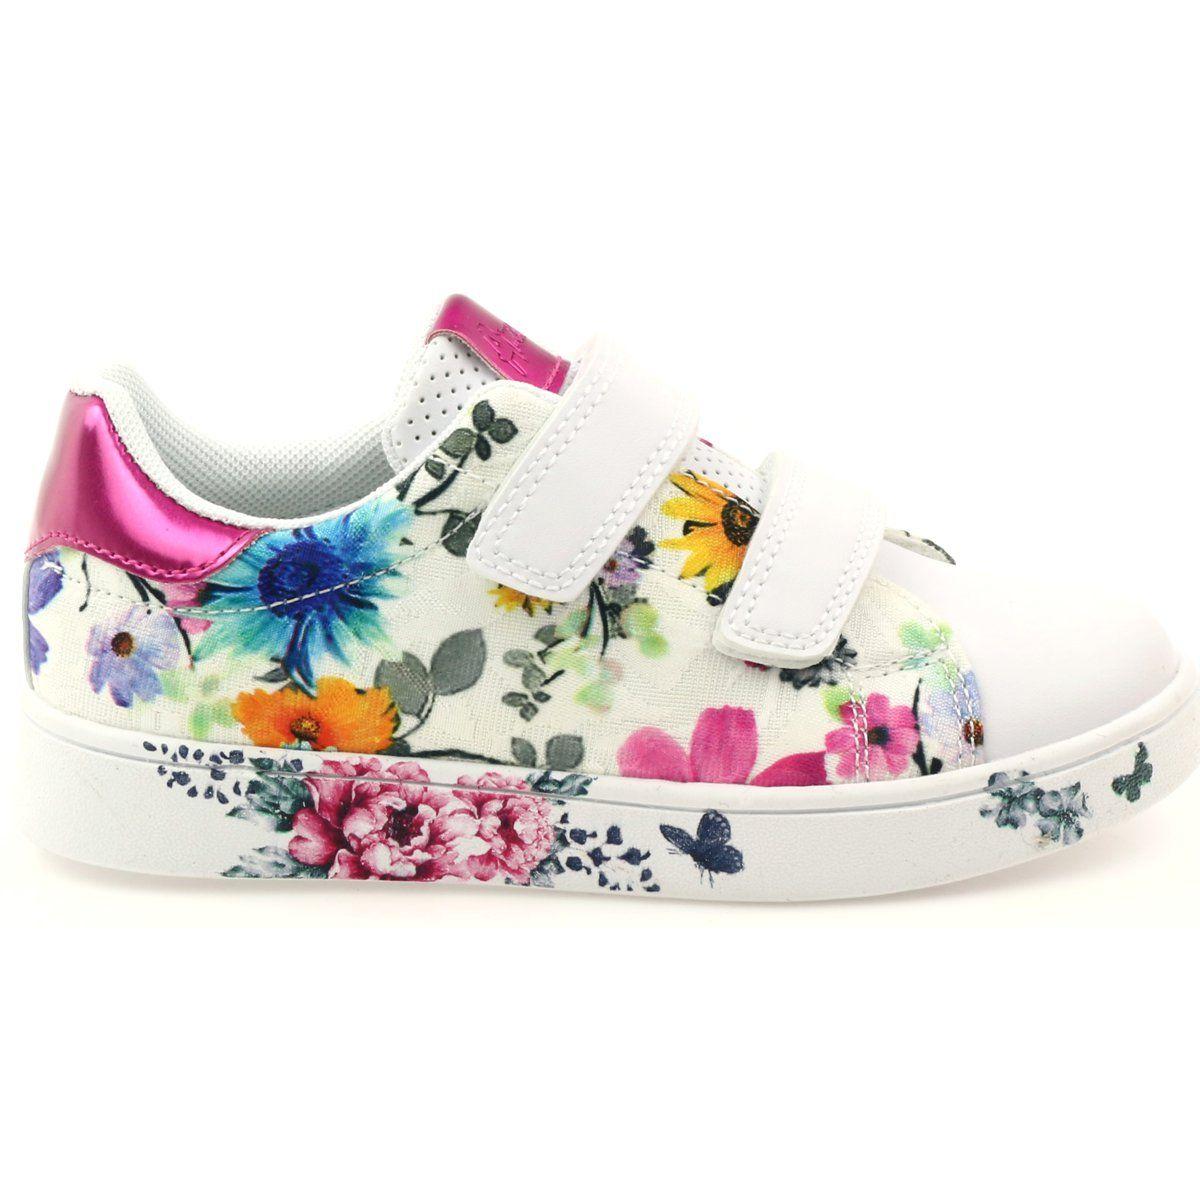 American Club Sportowe Trampki American Wkladka Skorzana Wielokolorowe Biale Winter Shoes Shoes Baby Shoes